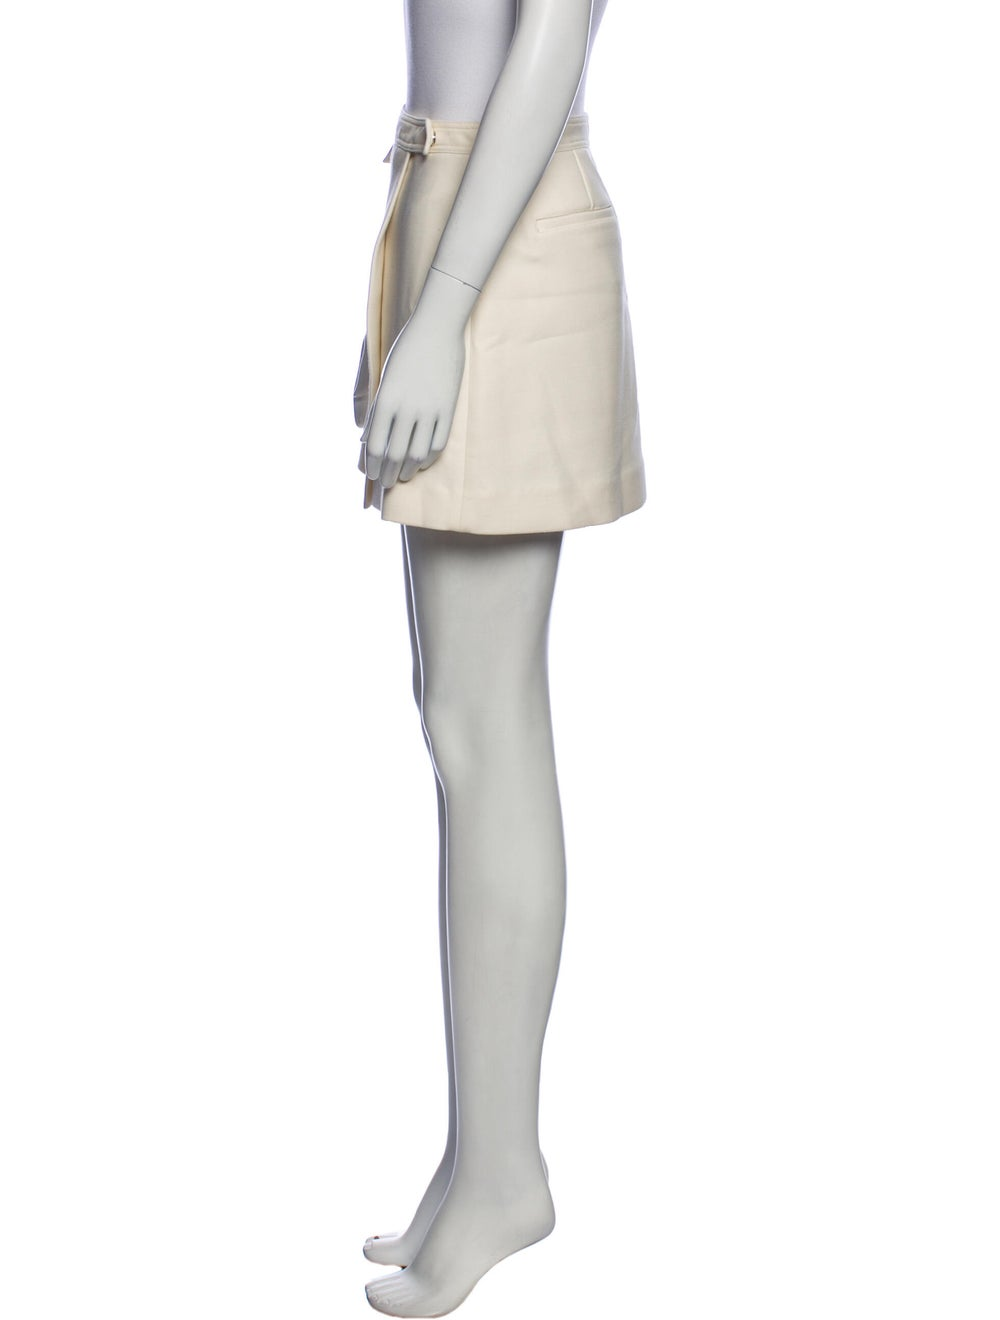 Theory Mini Skirt - image 2